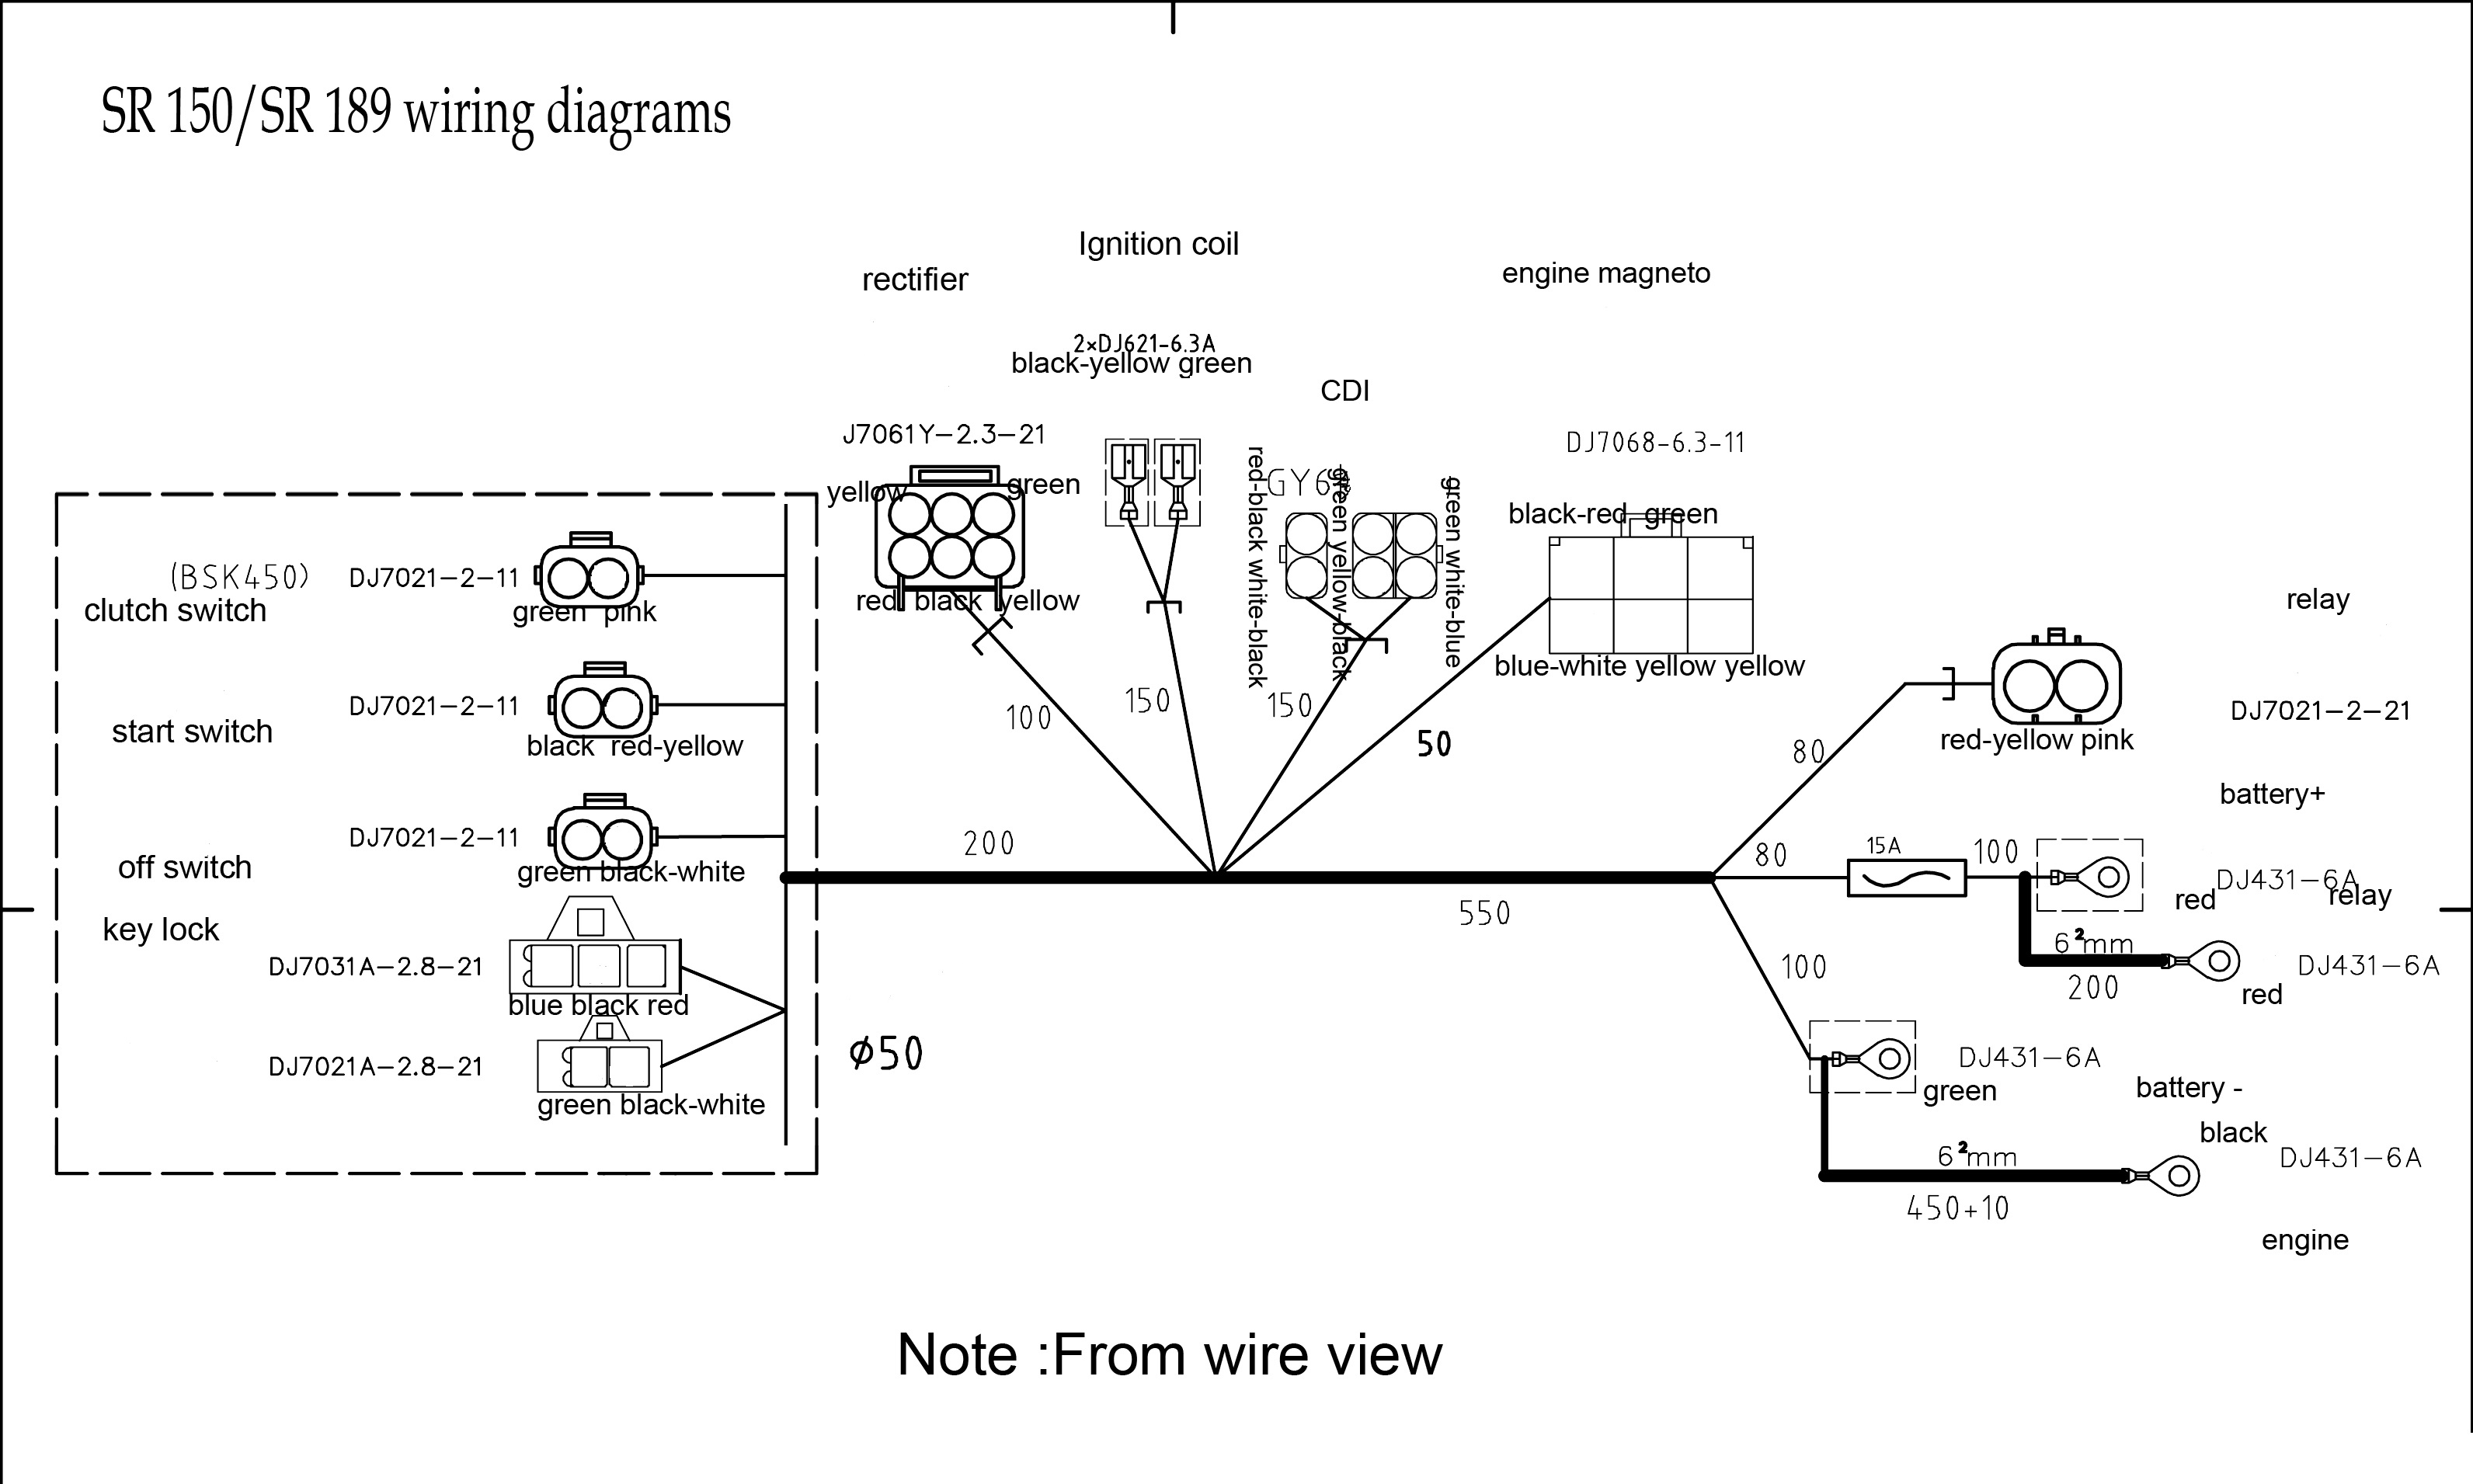 Tremendous Wrg 2199 Motofino 50Cc Wire Diagram 2010 Wiring Cloud Orsalboapumohammedshrineorg